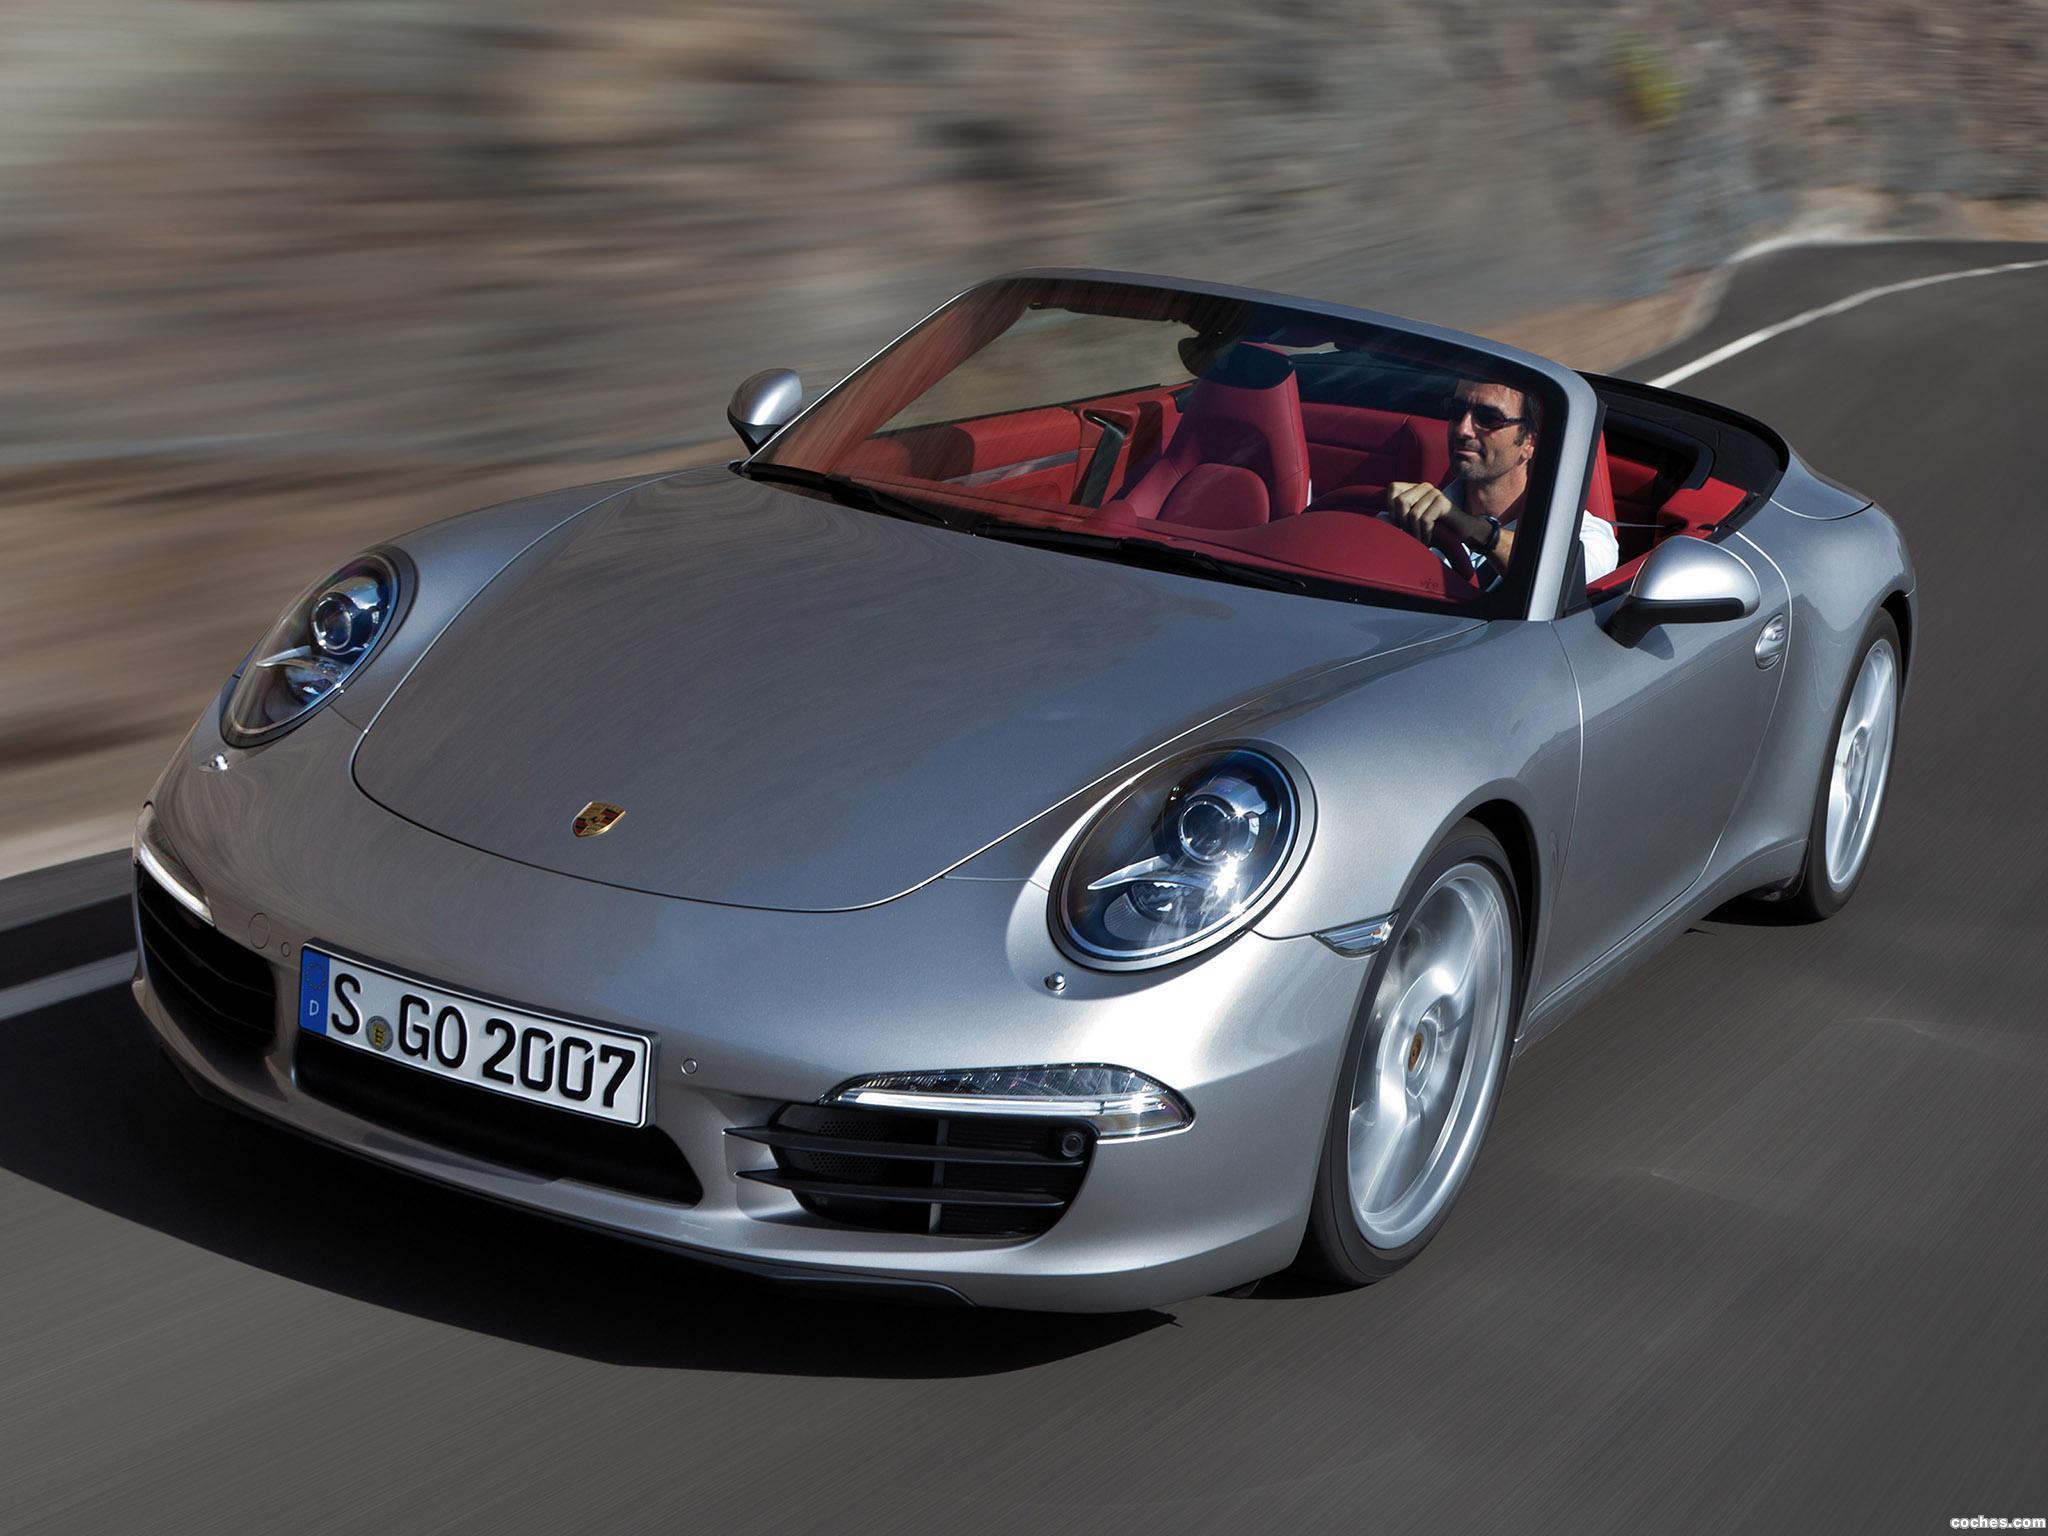 porsche_911-carrera-cabriolet-2012_r4.jpg